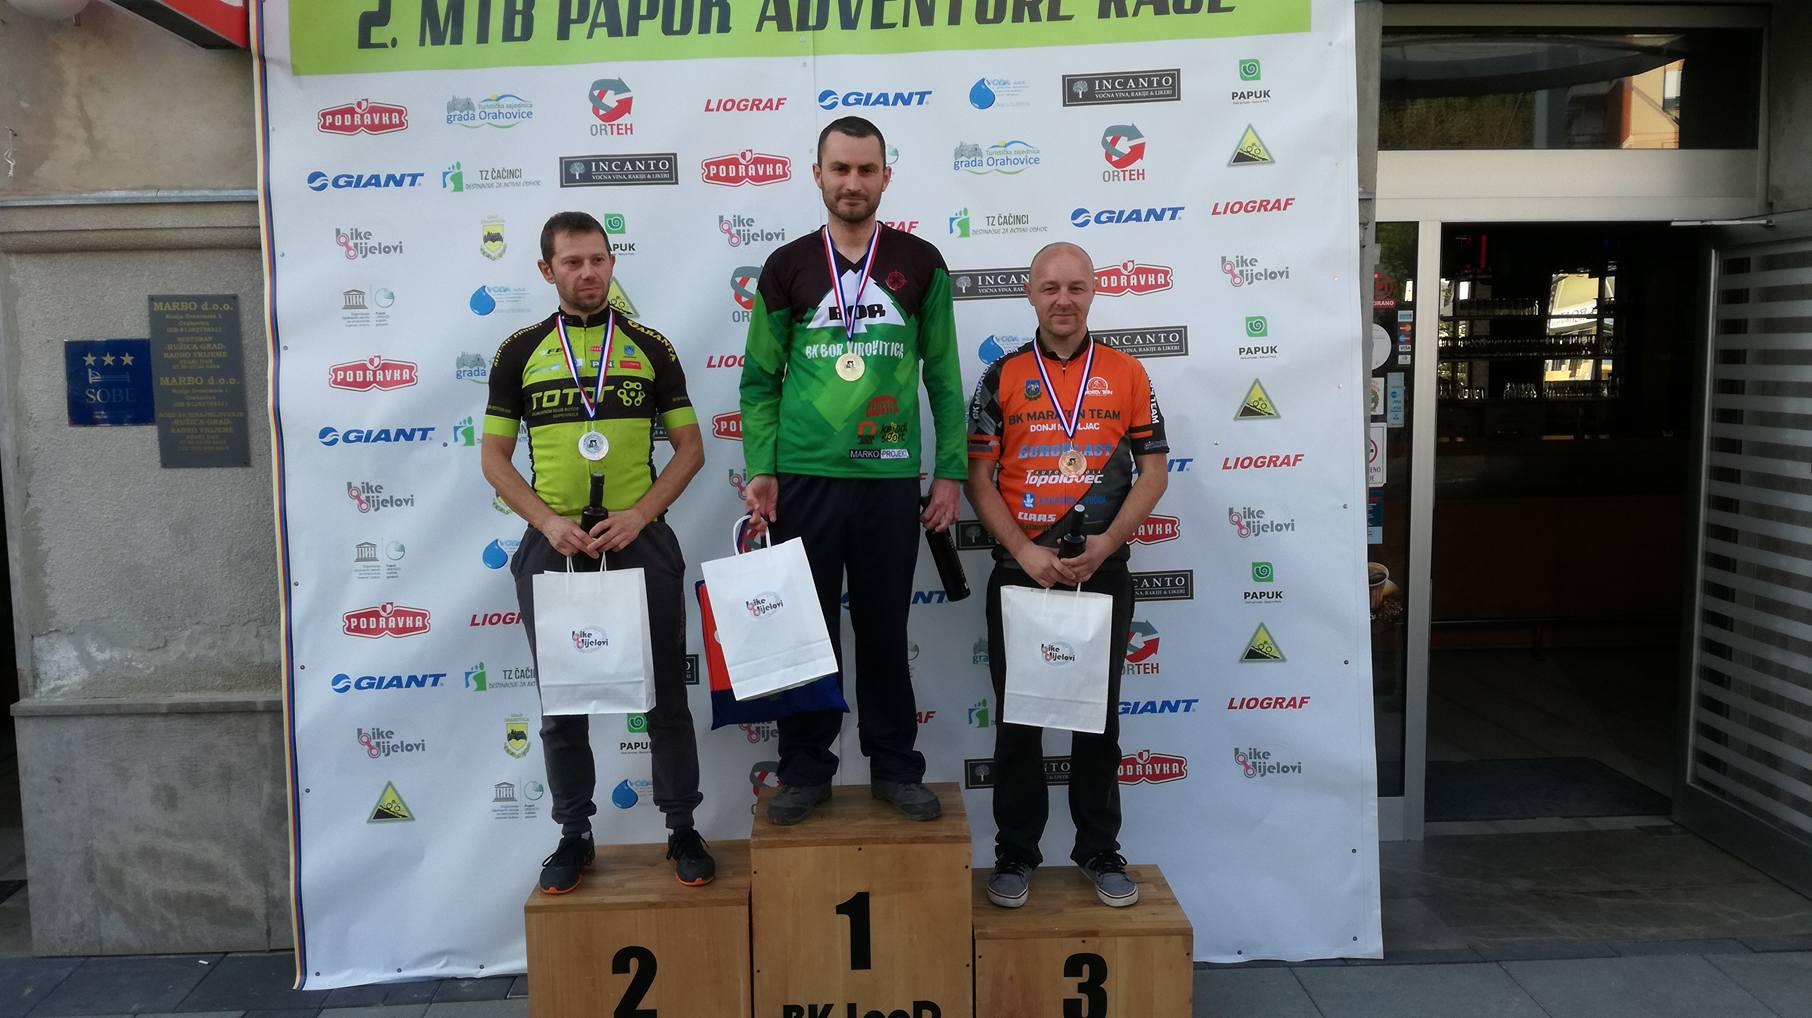 MTB Papuk Adventure Race